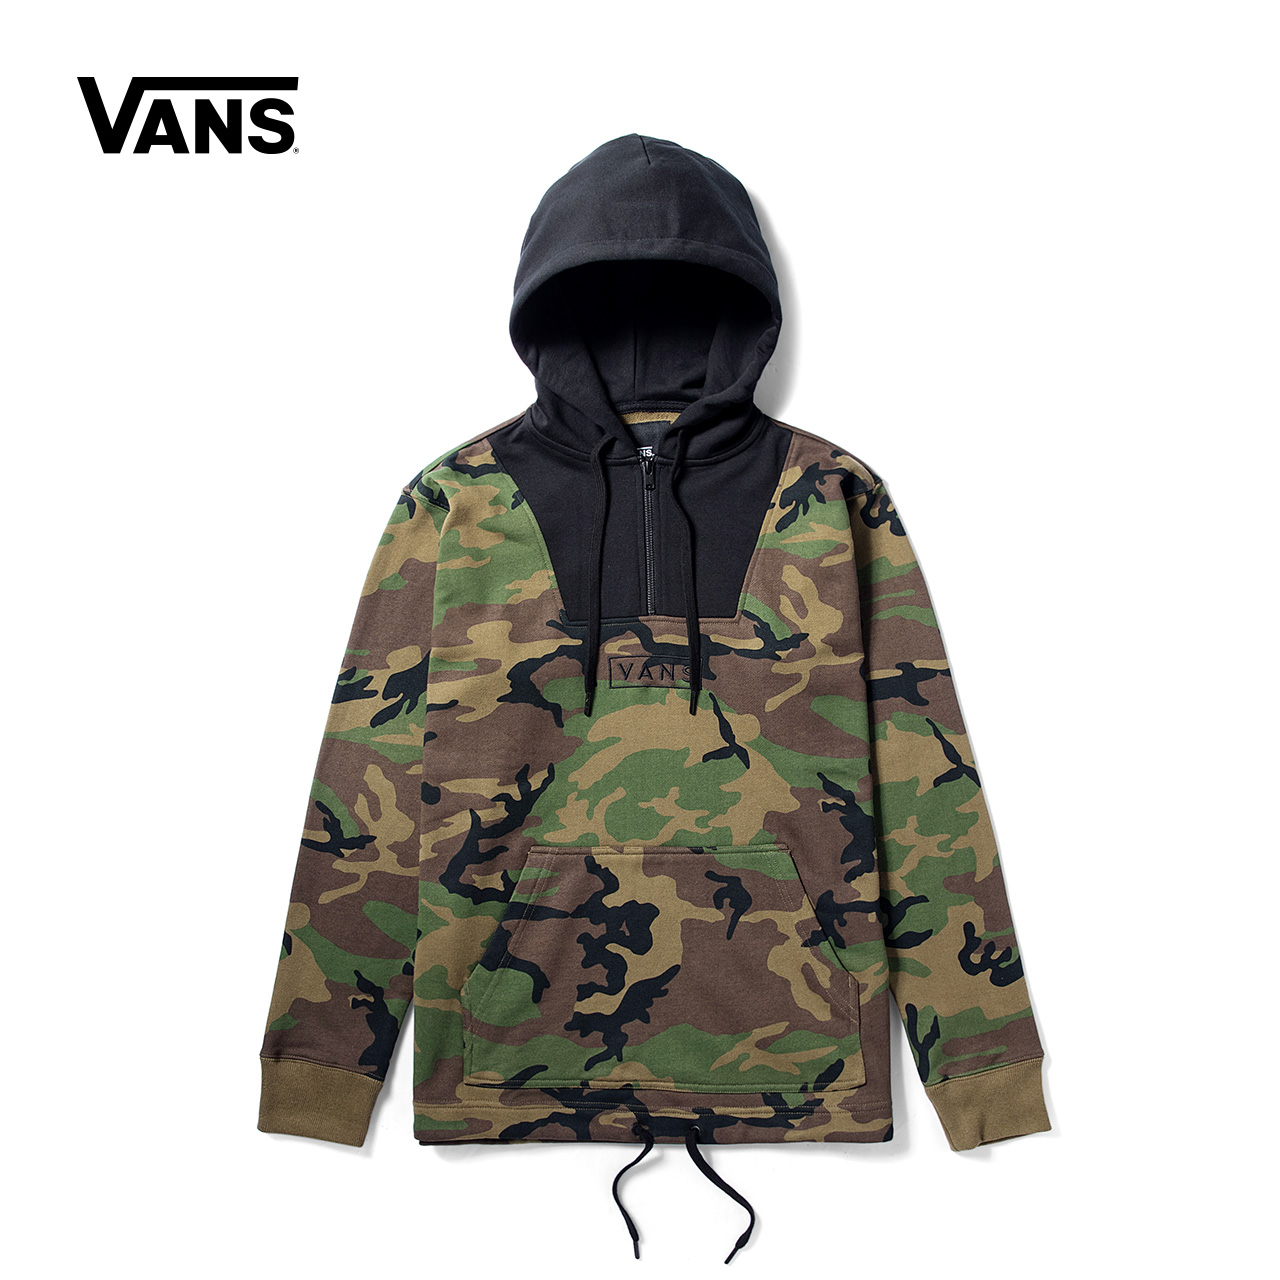 Vans 范斯官方秋季男款迷彩印花连帽卫衣|VN0A3DG6WVD